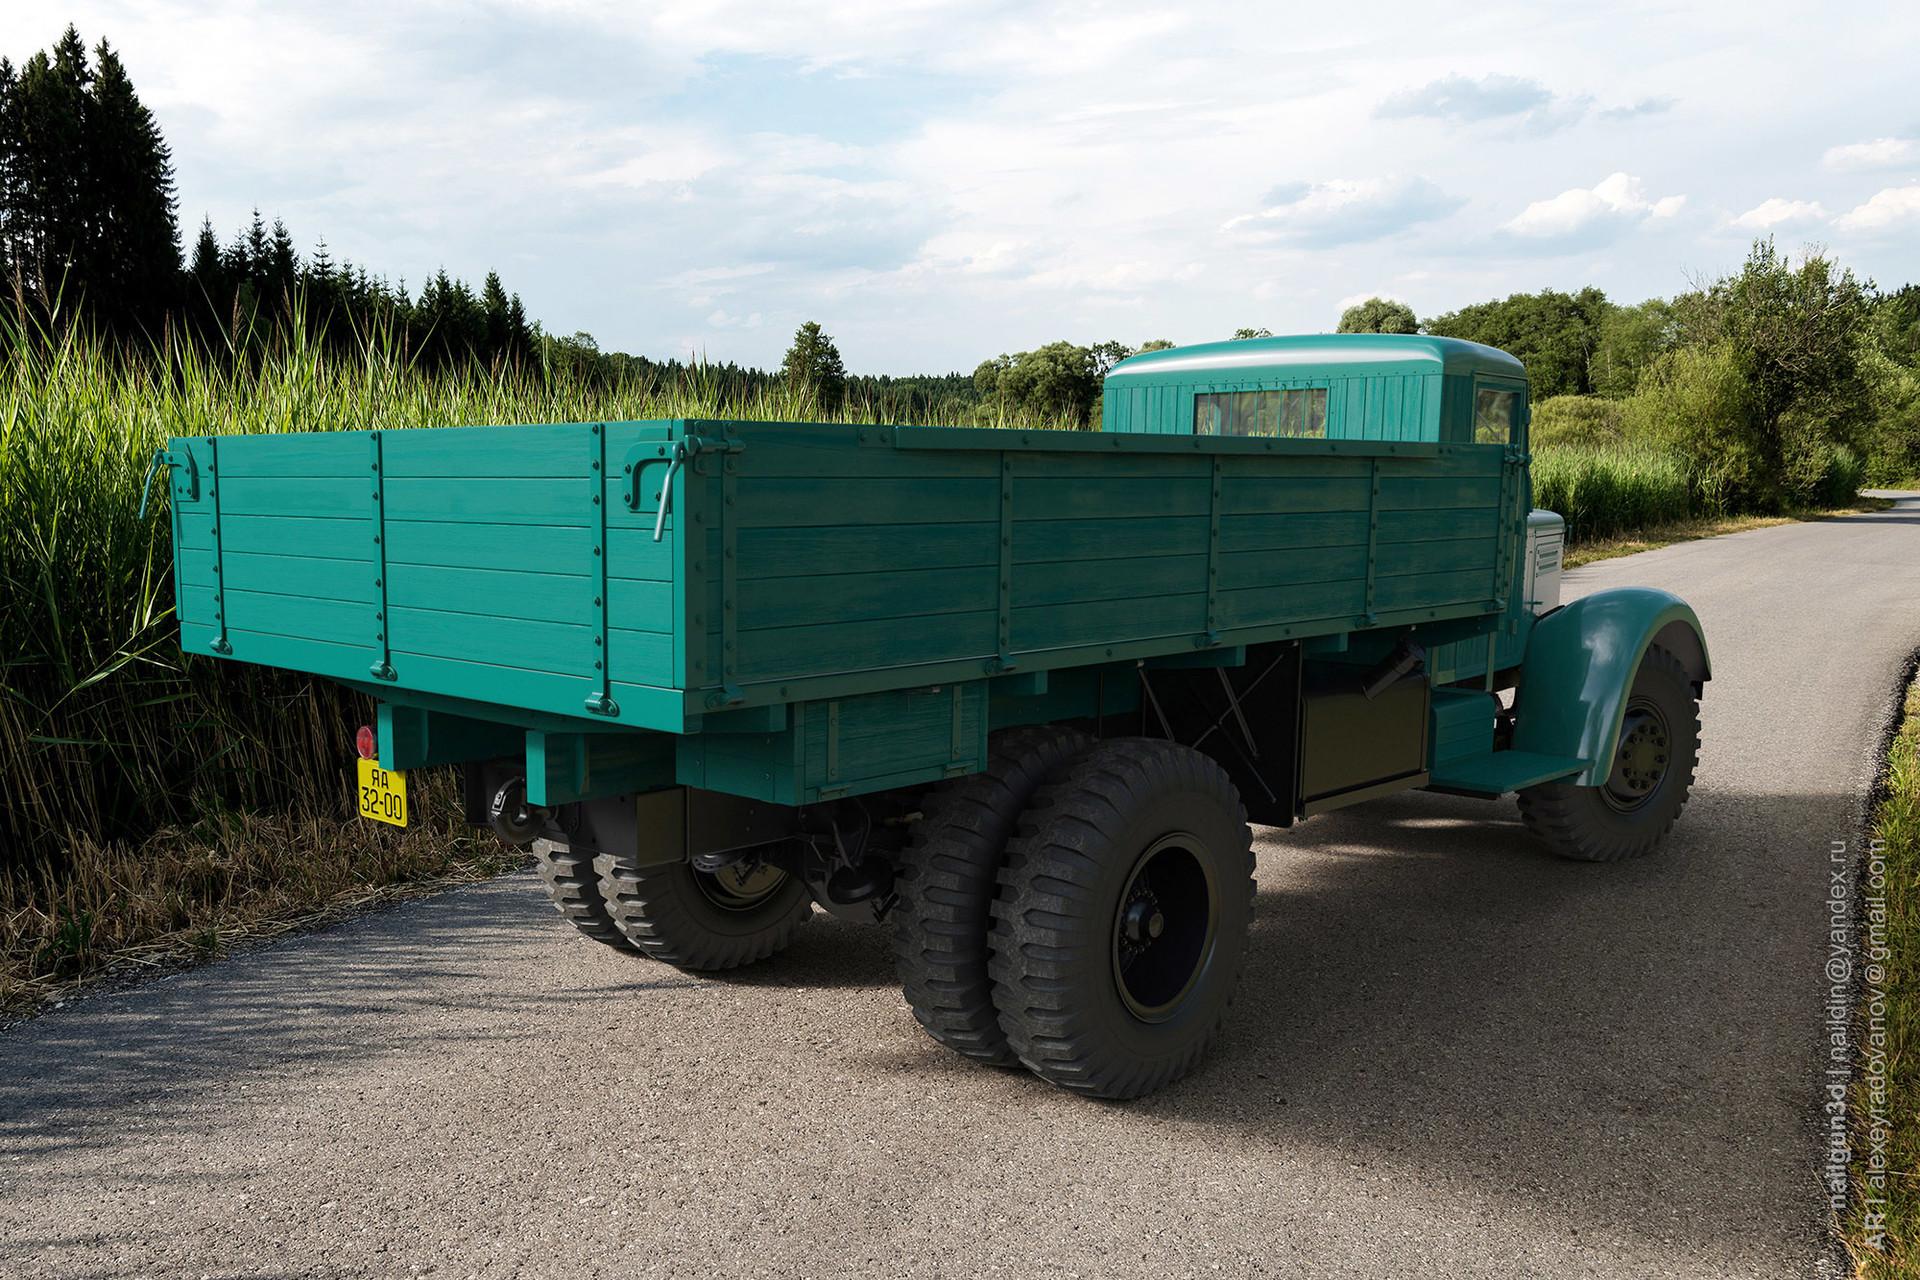 Nail khusnutdinov alg 019 010 yaz 200 rear view 3x